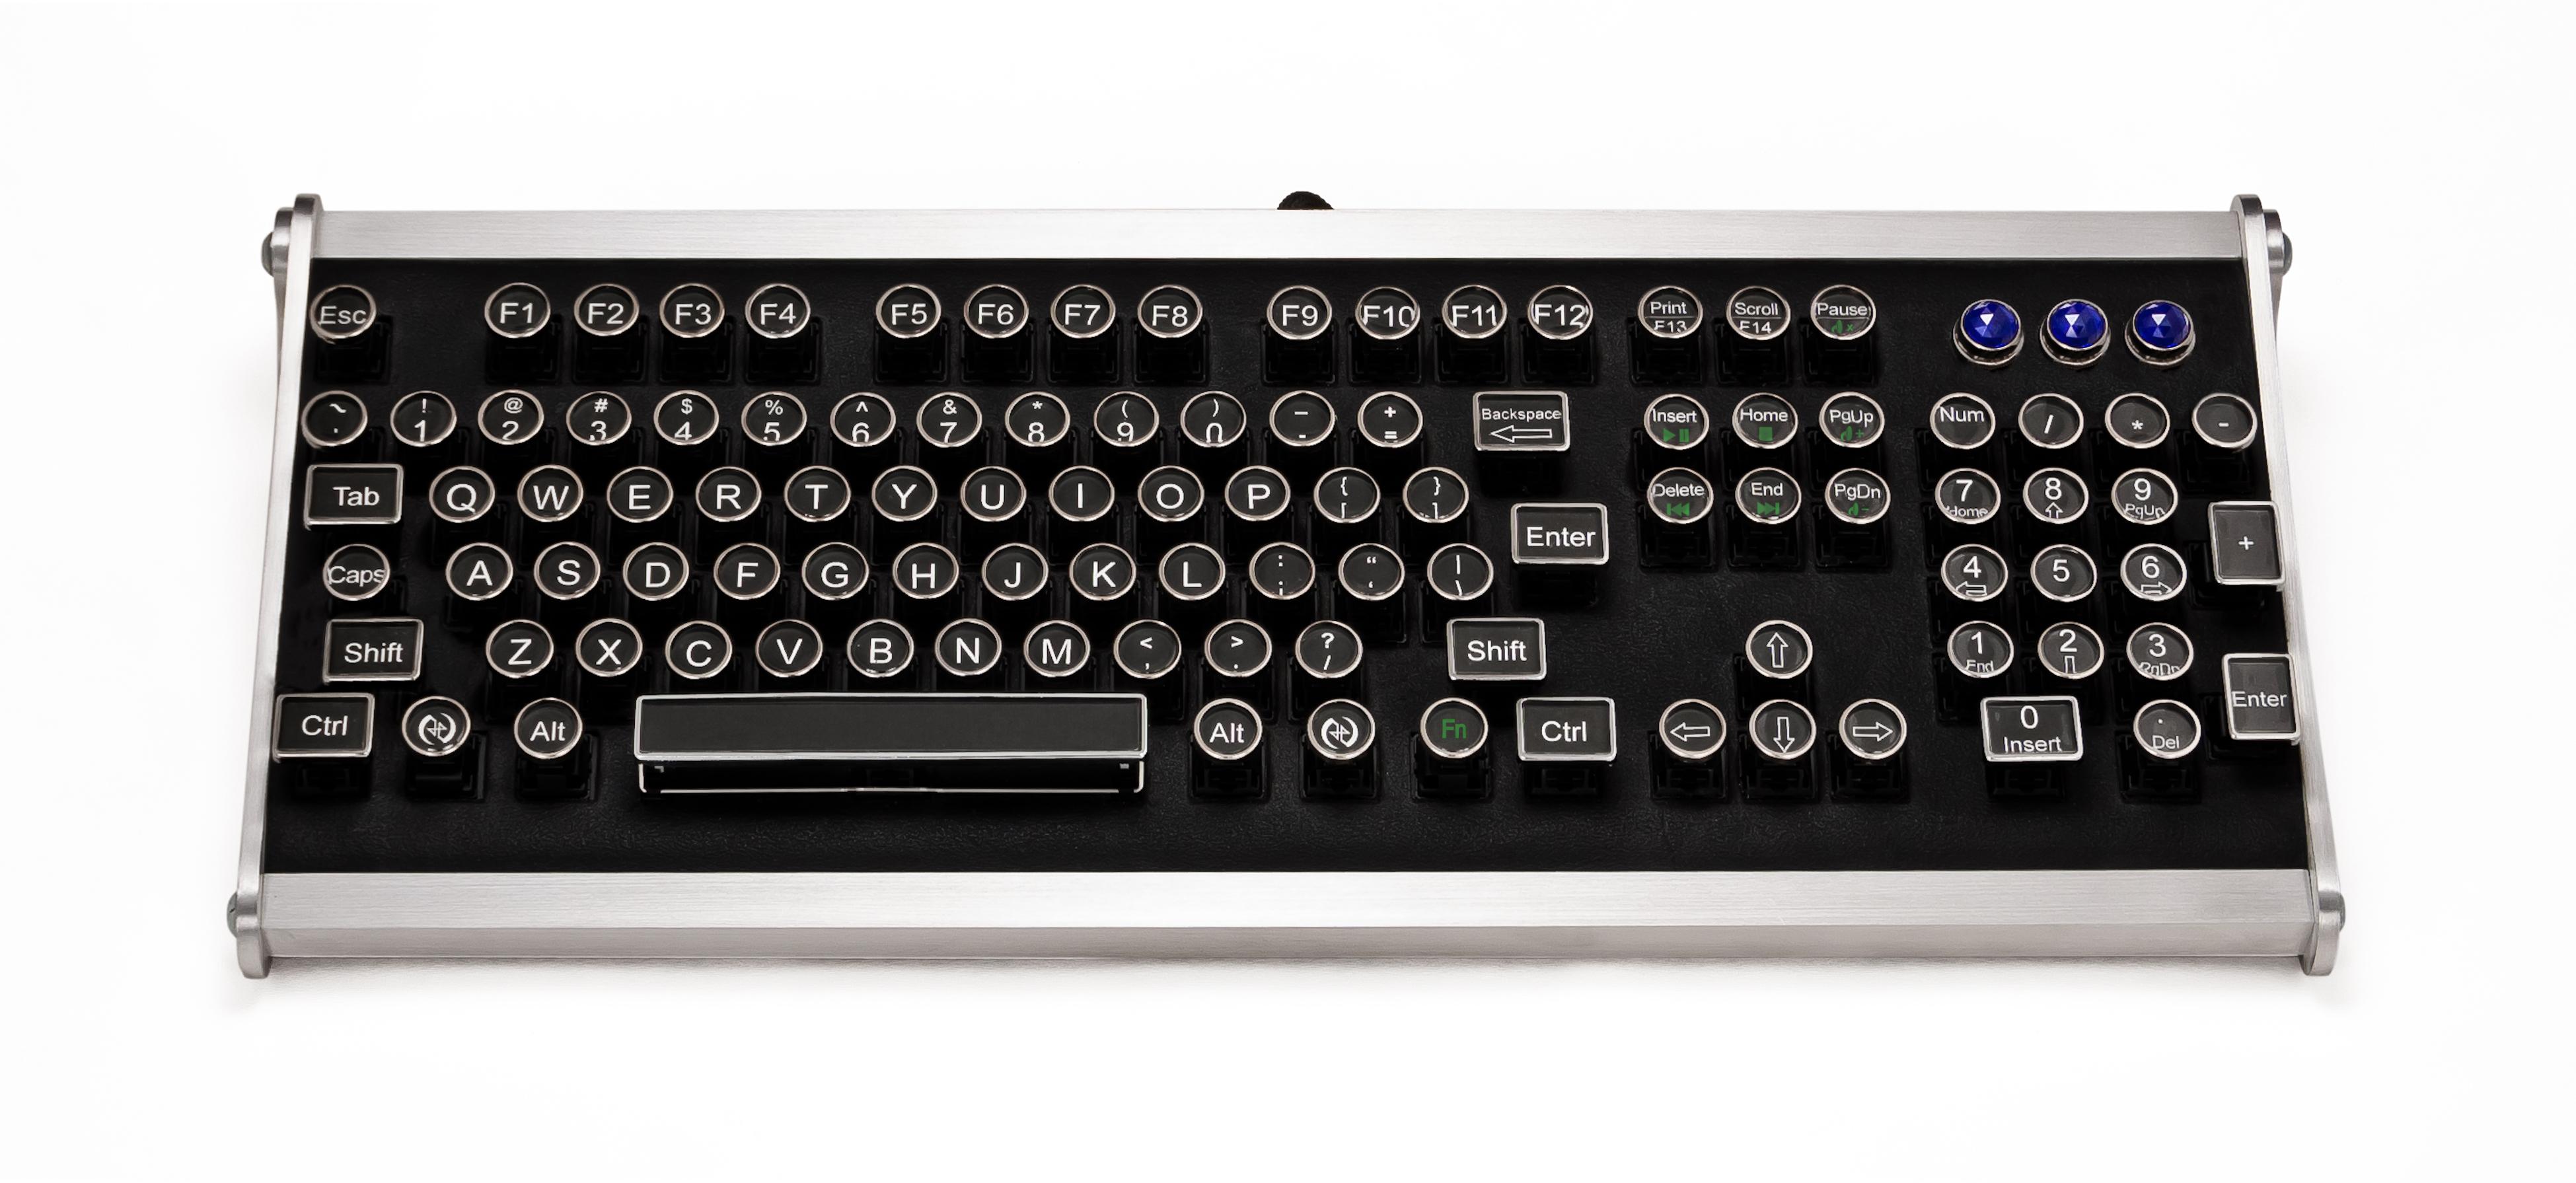 Datamancer Custom Keyboards